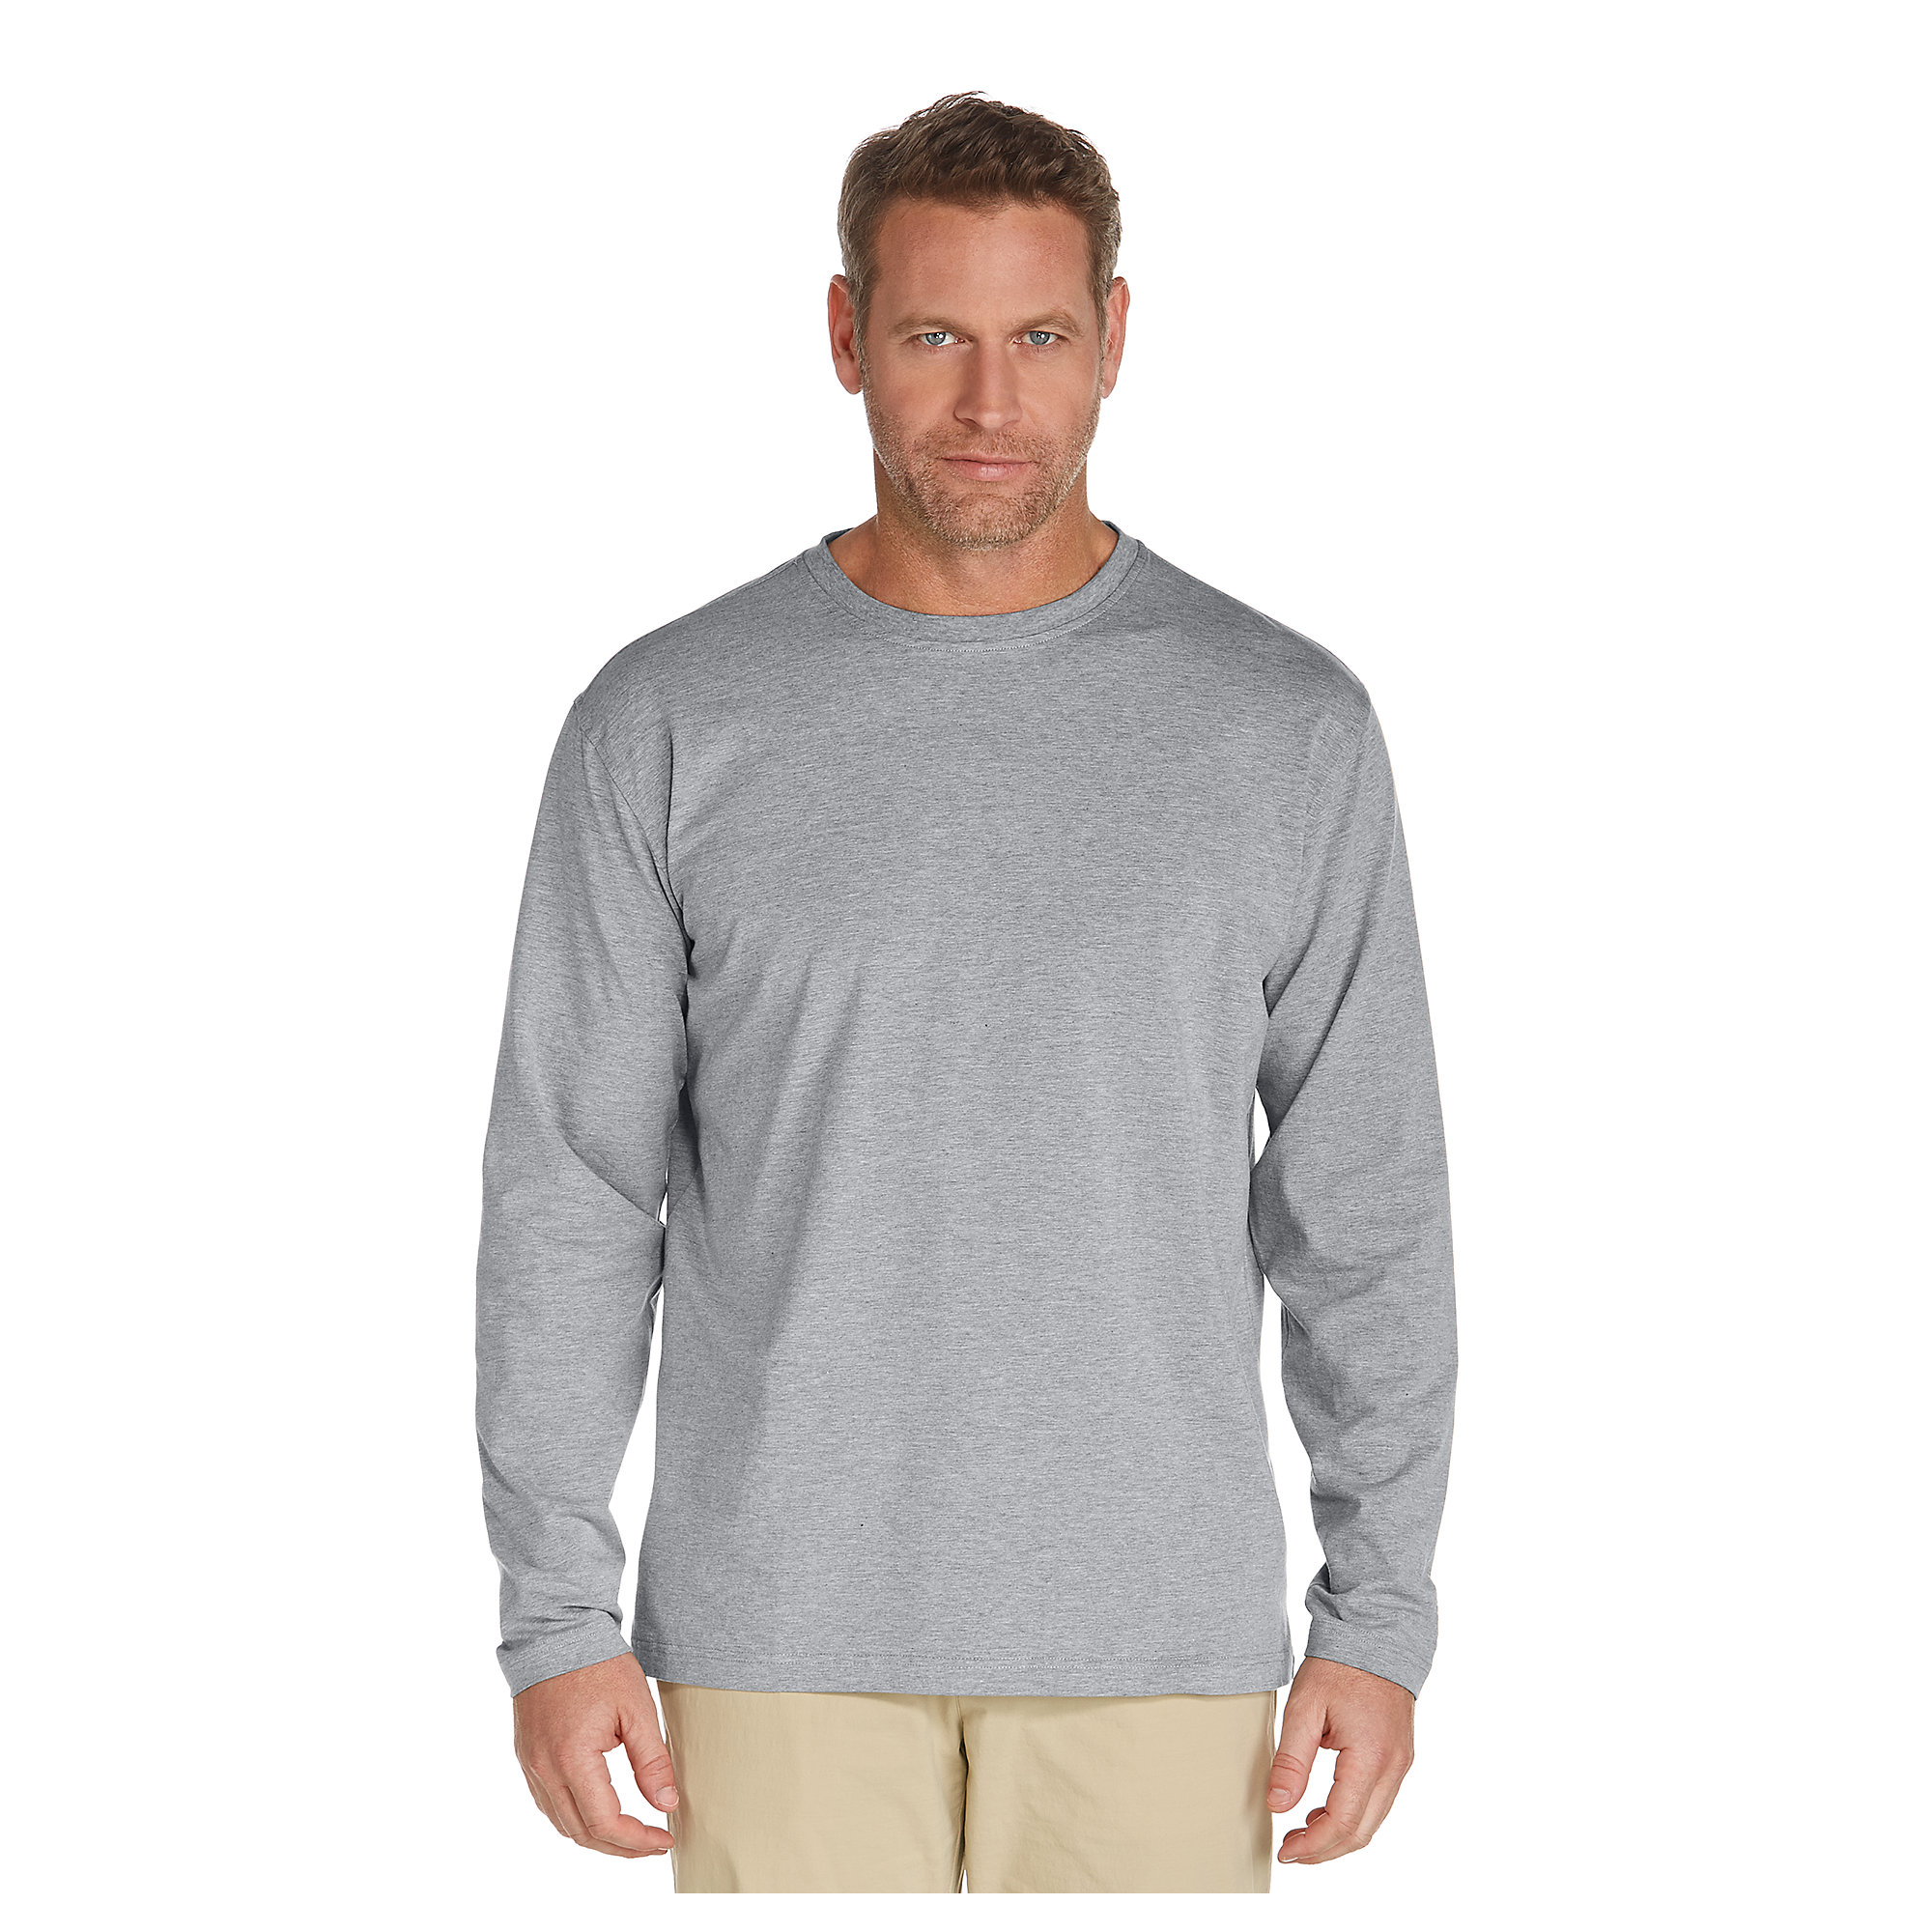 coolibar upf 50 mens zno sleeve t shirt sun protective